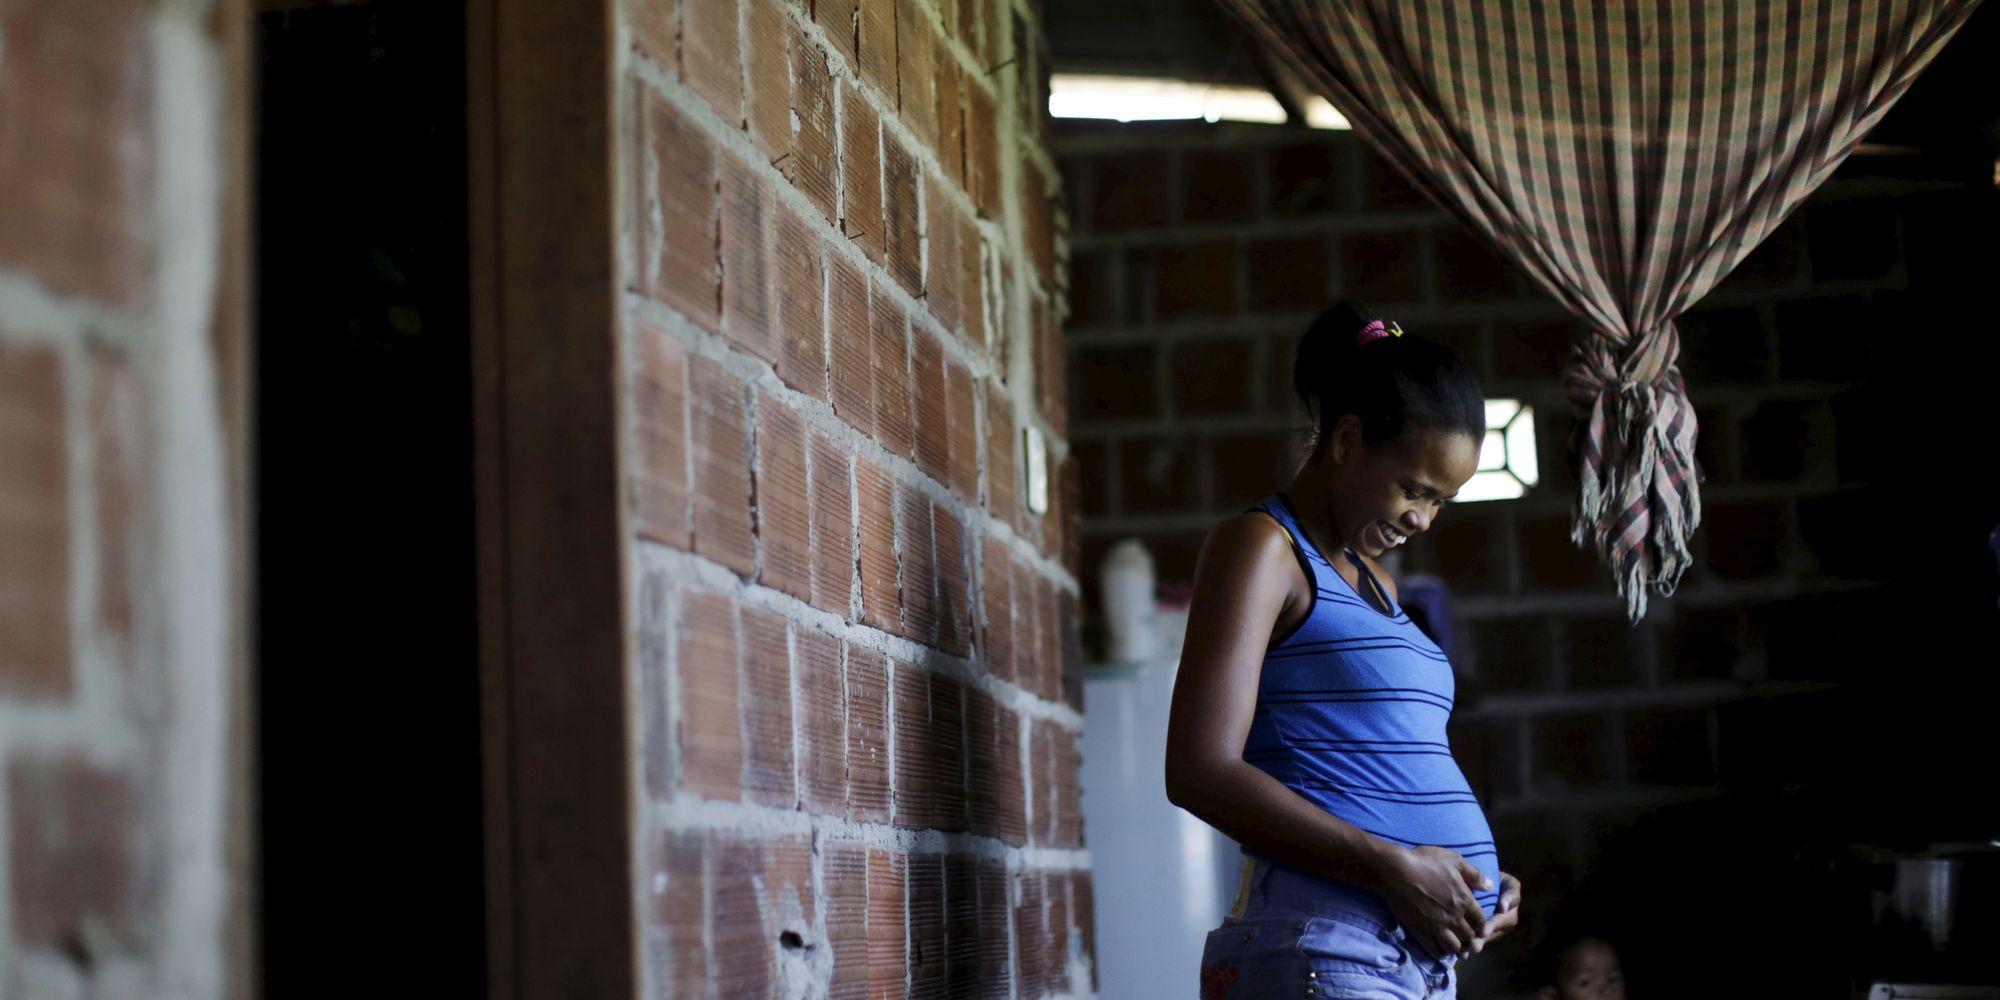 Many Brazilian Women Are Avoiding Pregnancy Over Zika Fears